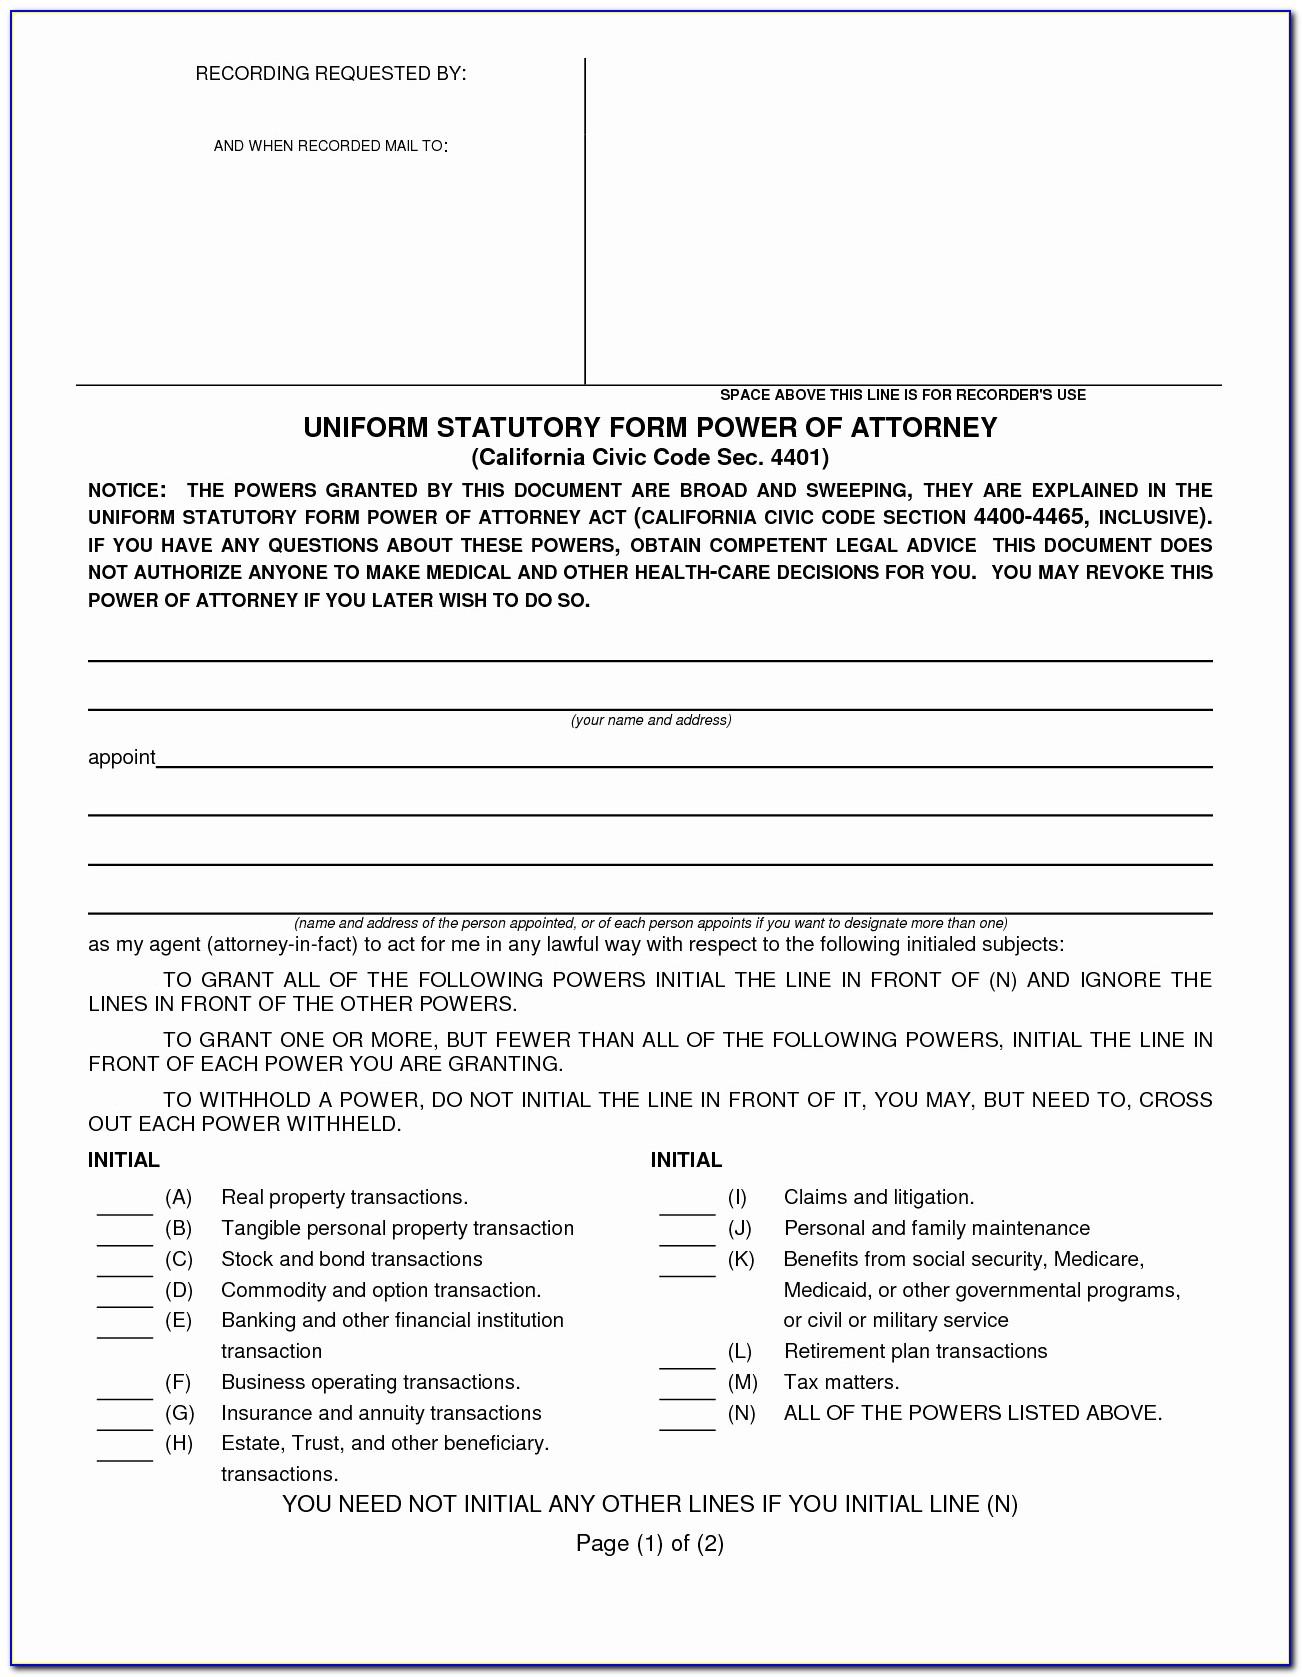 Florida Designation Of Health Care Surrogate Form Free Lovely Florida Designation Health Care Surrogate Form Free New Florida